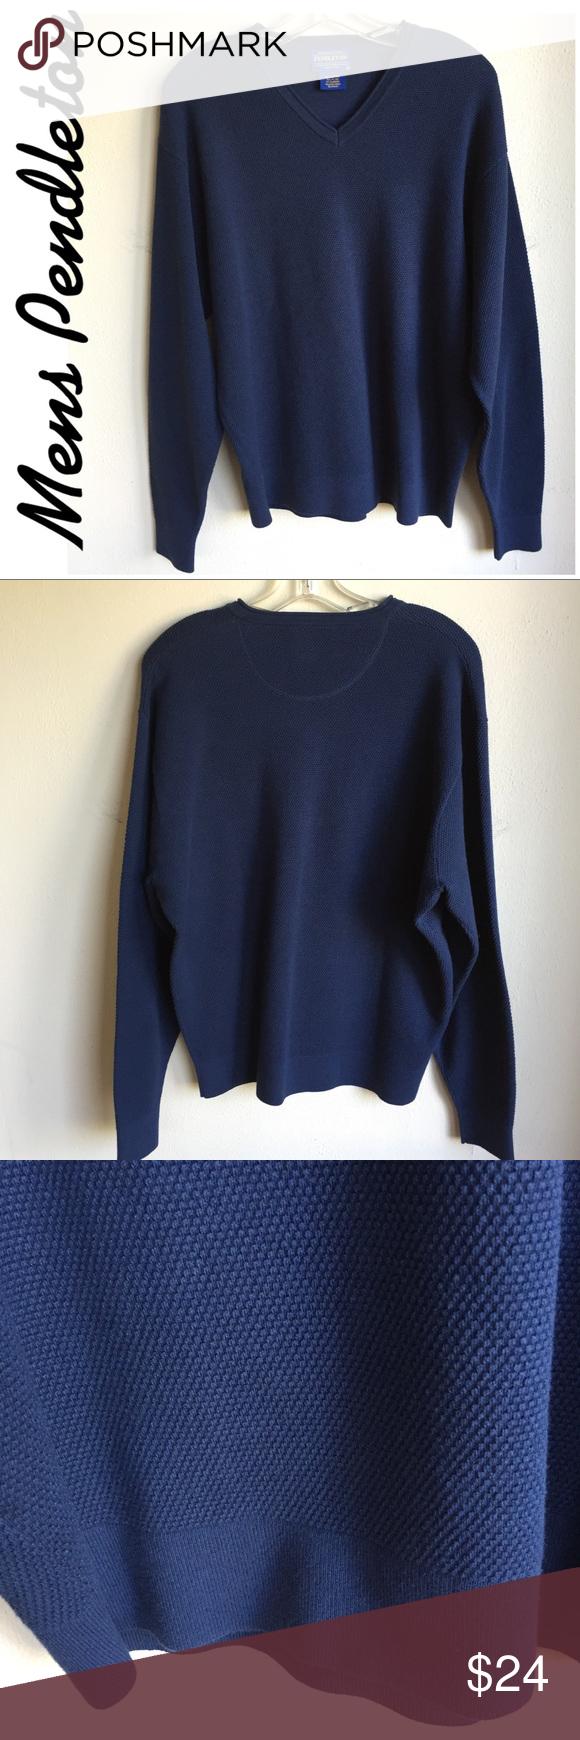 Pendleton Mens Navy L Cotton/Nylon/Spandex Sweater